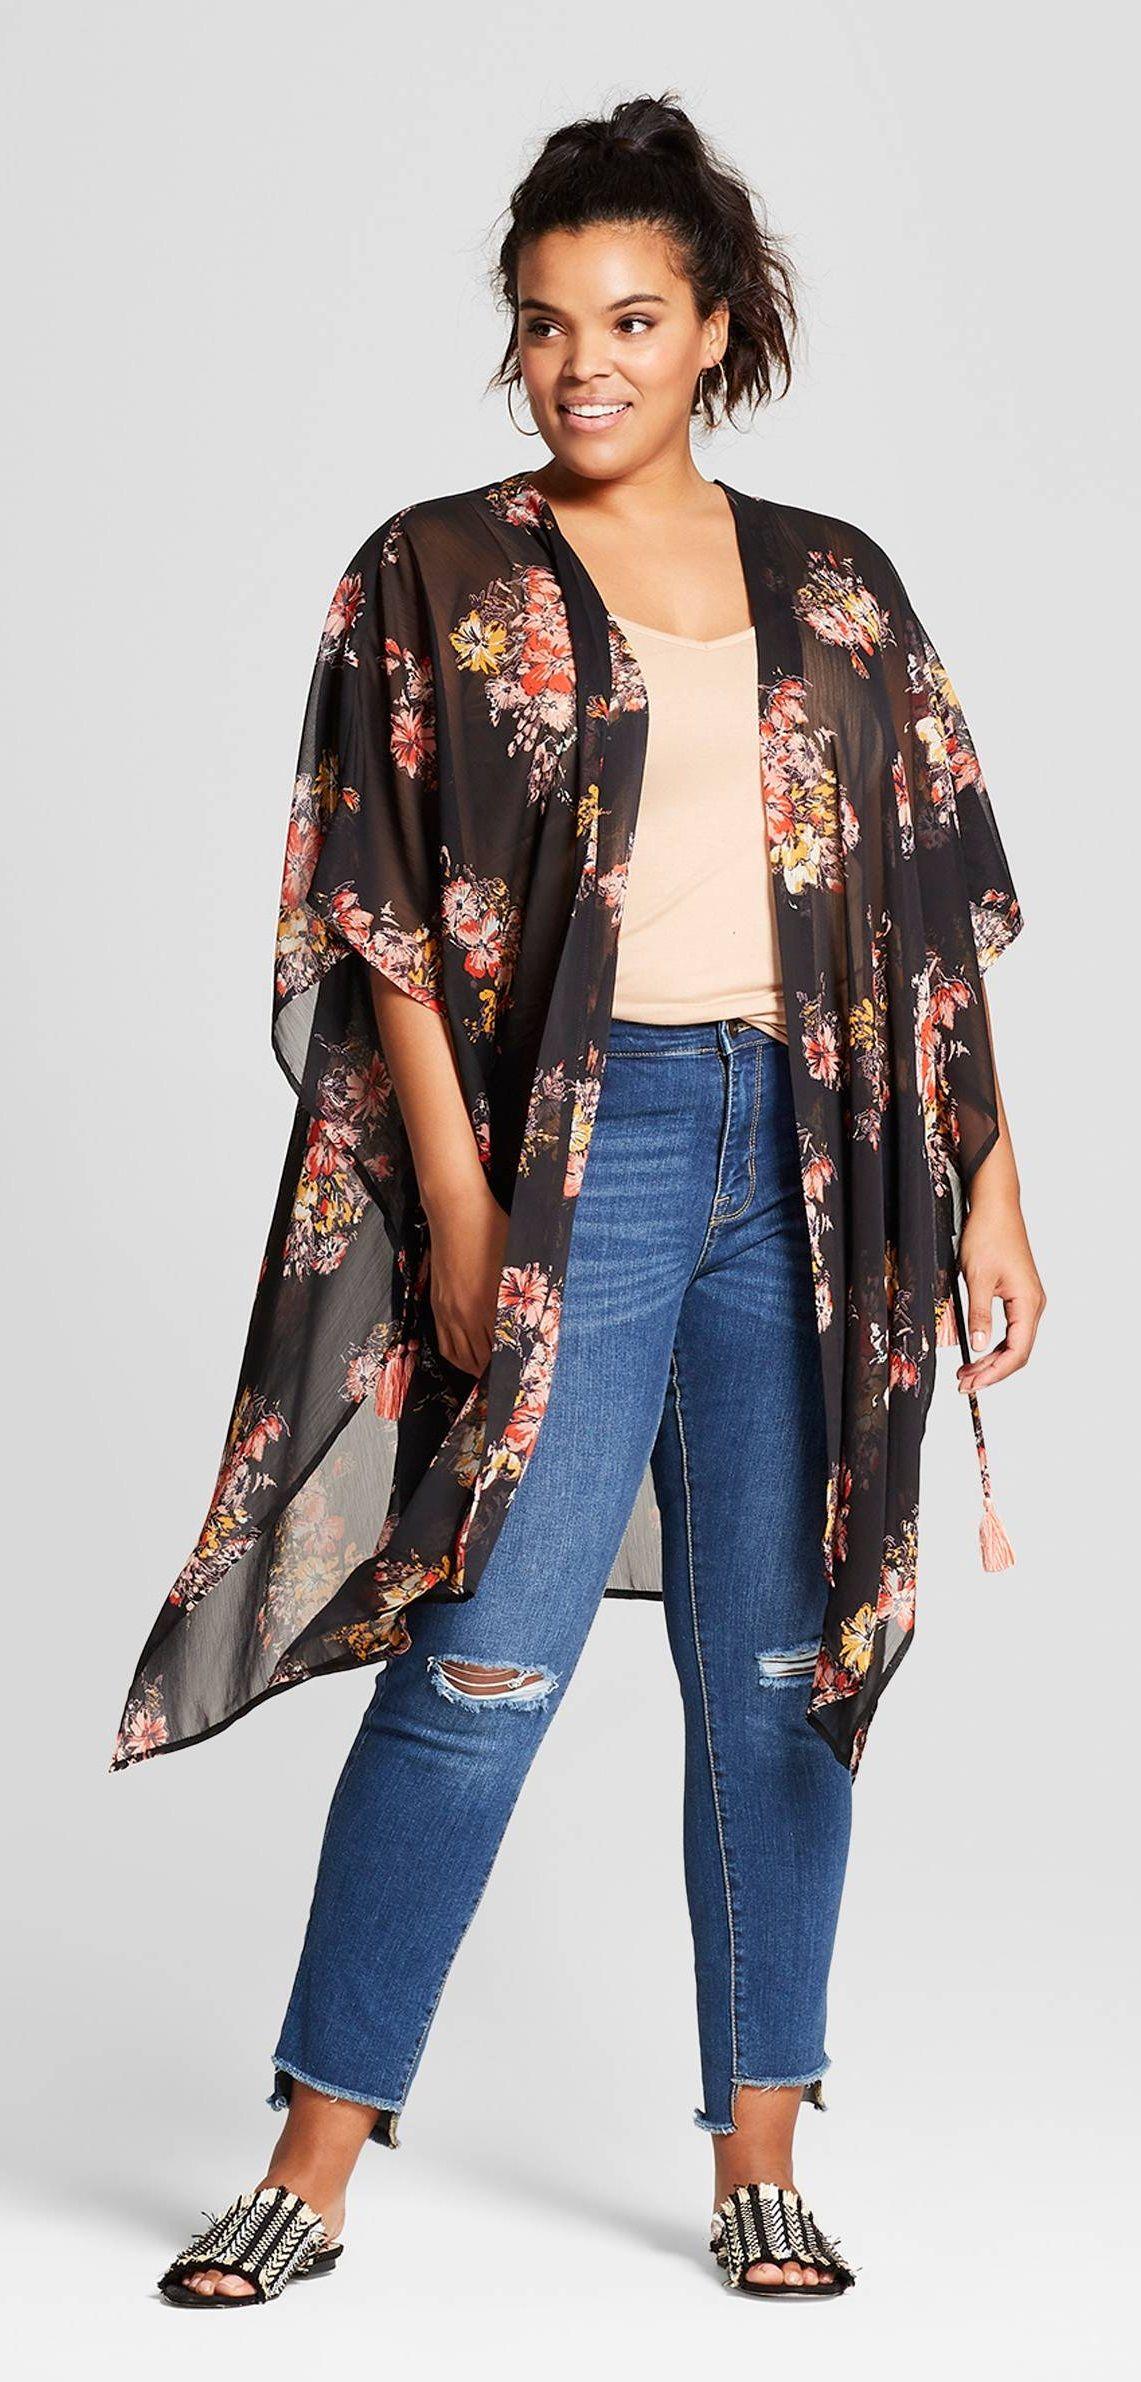 9b0c09c3 Plus Size Kimono | Moda | Moda para gorditas, Moda de mujeres ...